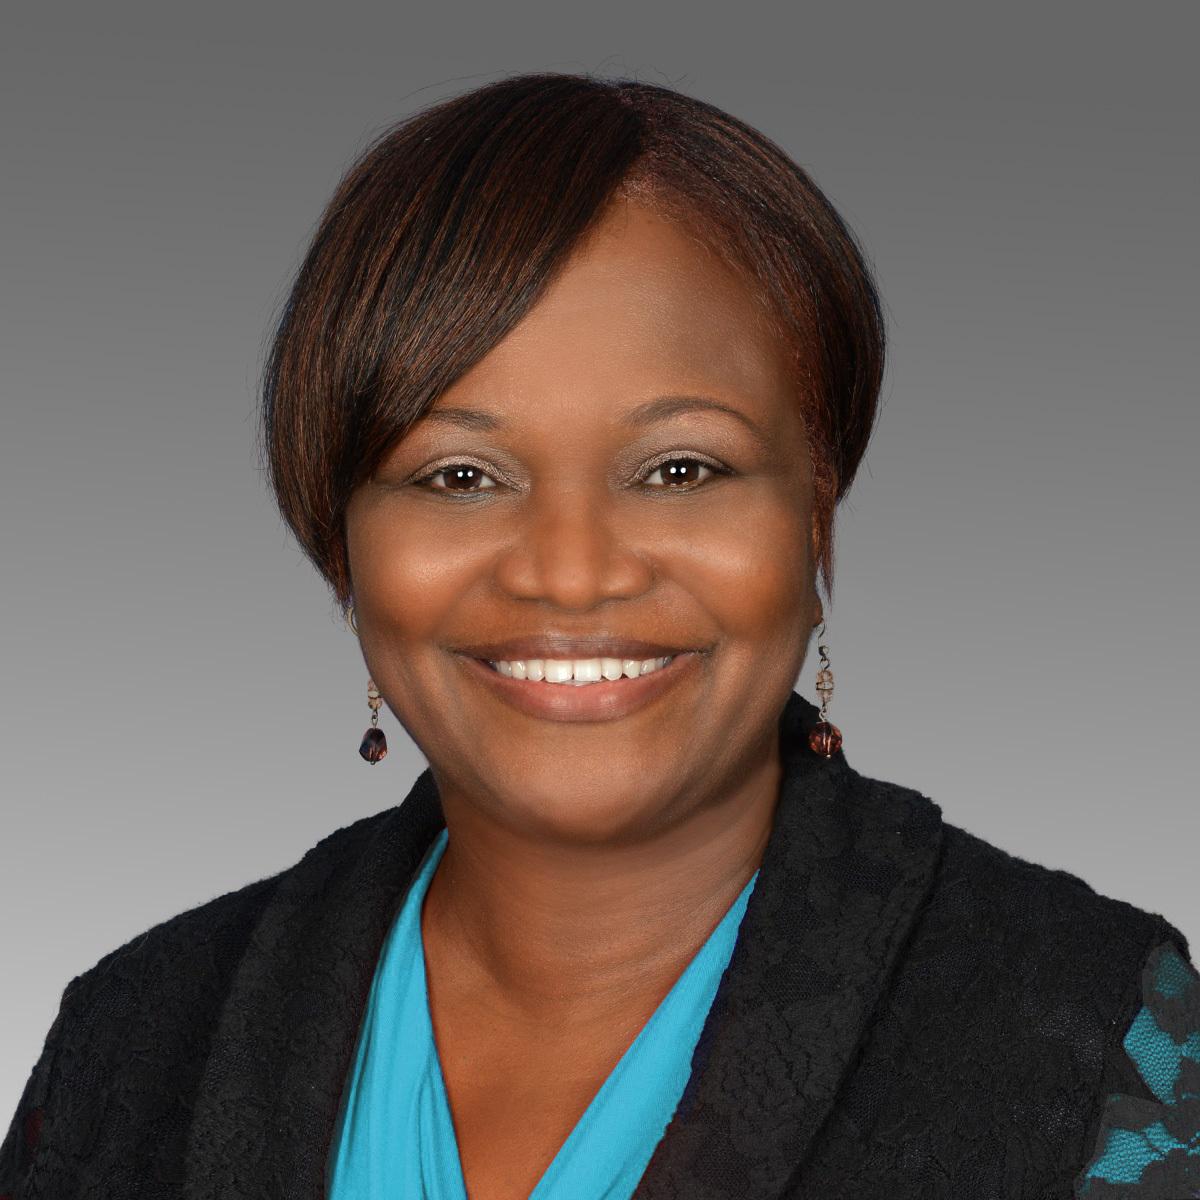 Audrey Wyatt, Leadership & Talent Development Partner